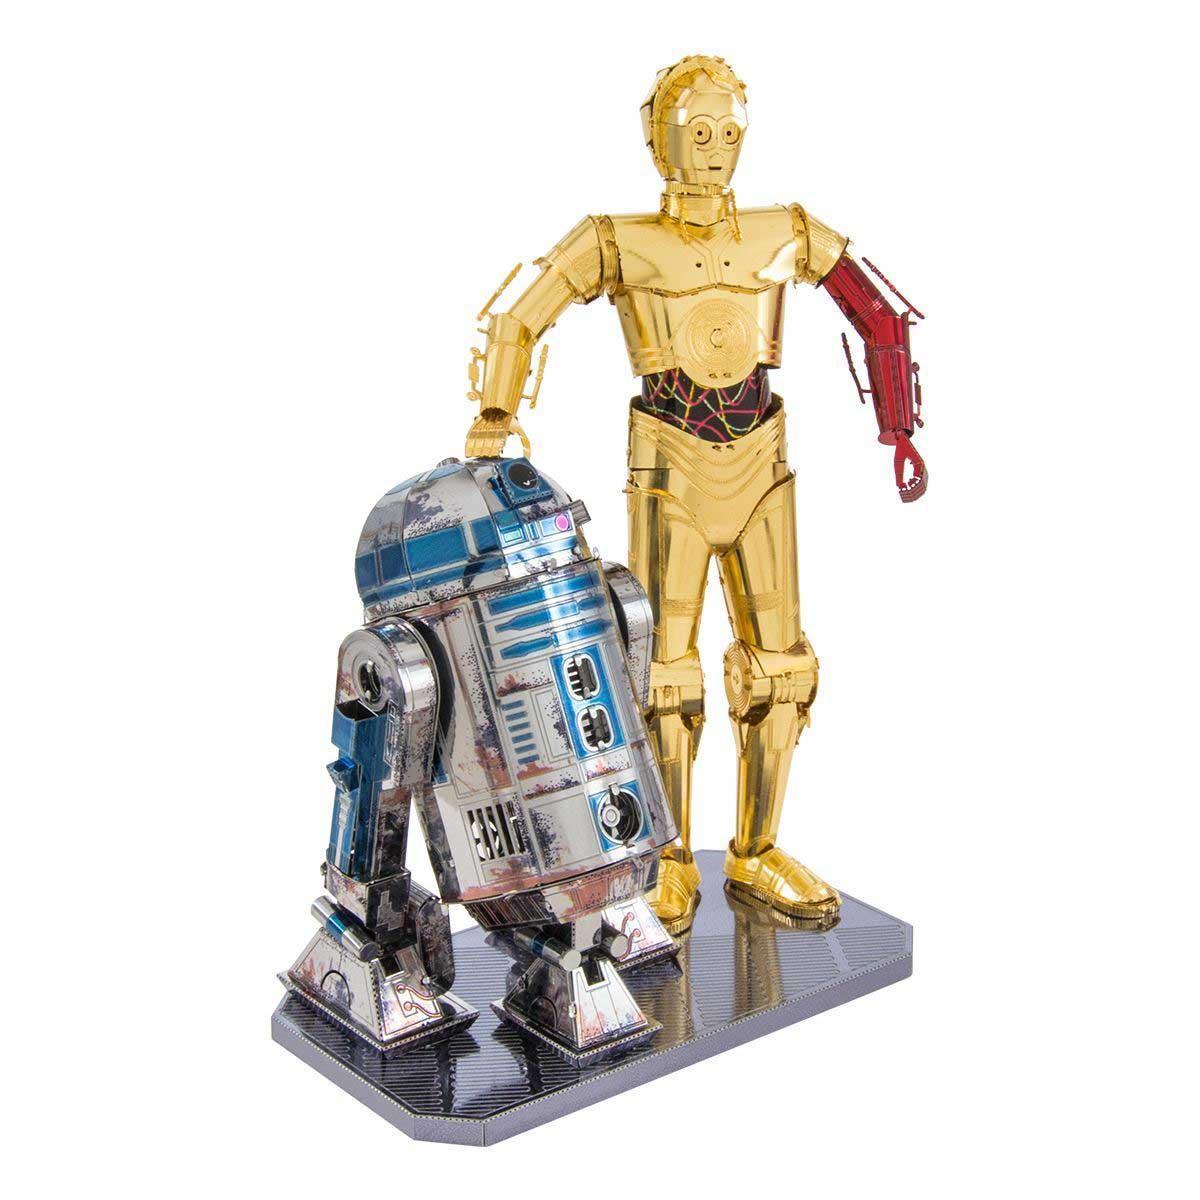 R2-D2 & C-3PO Movies / Books / TV Metal Puzzles